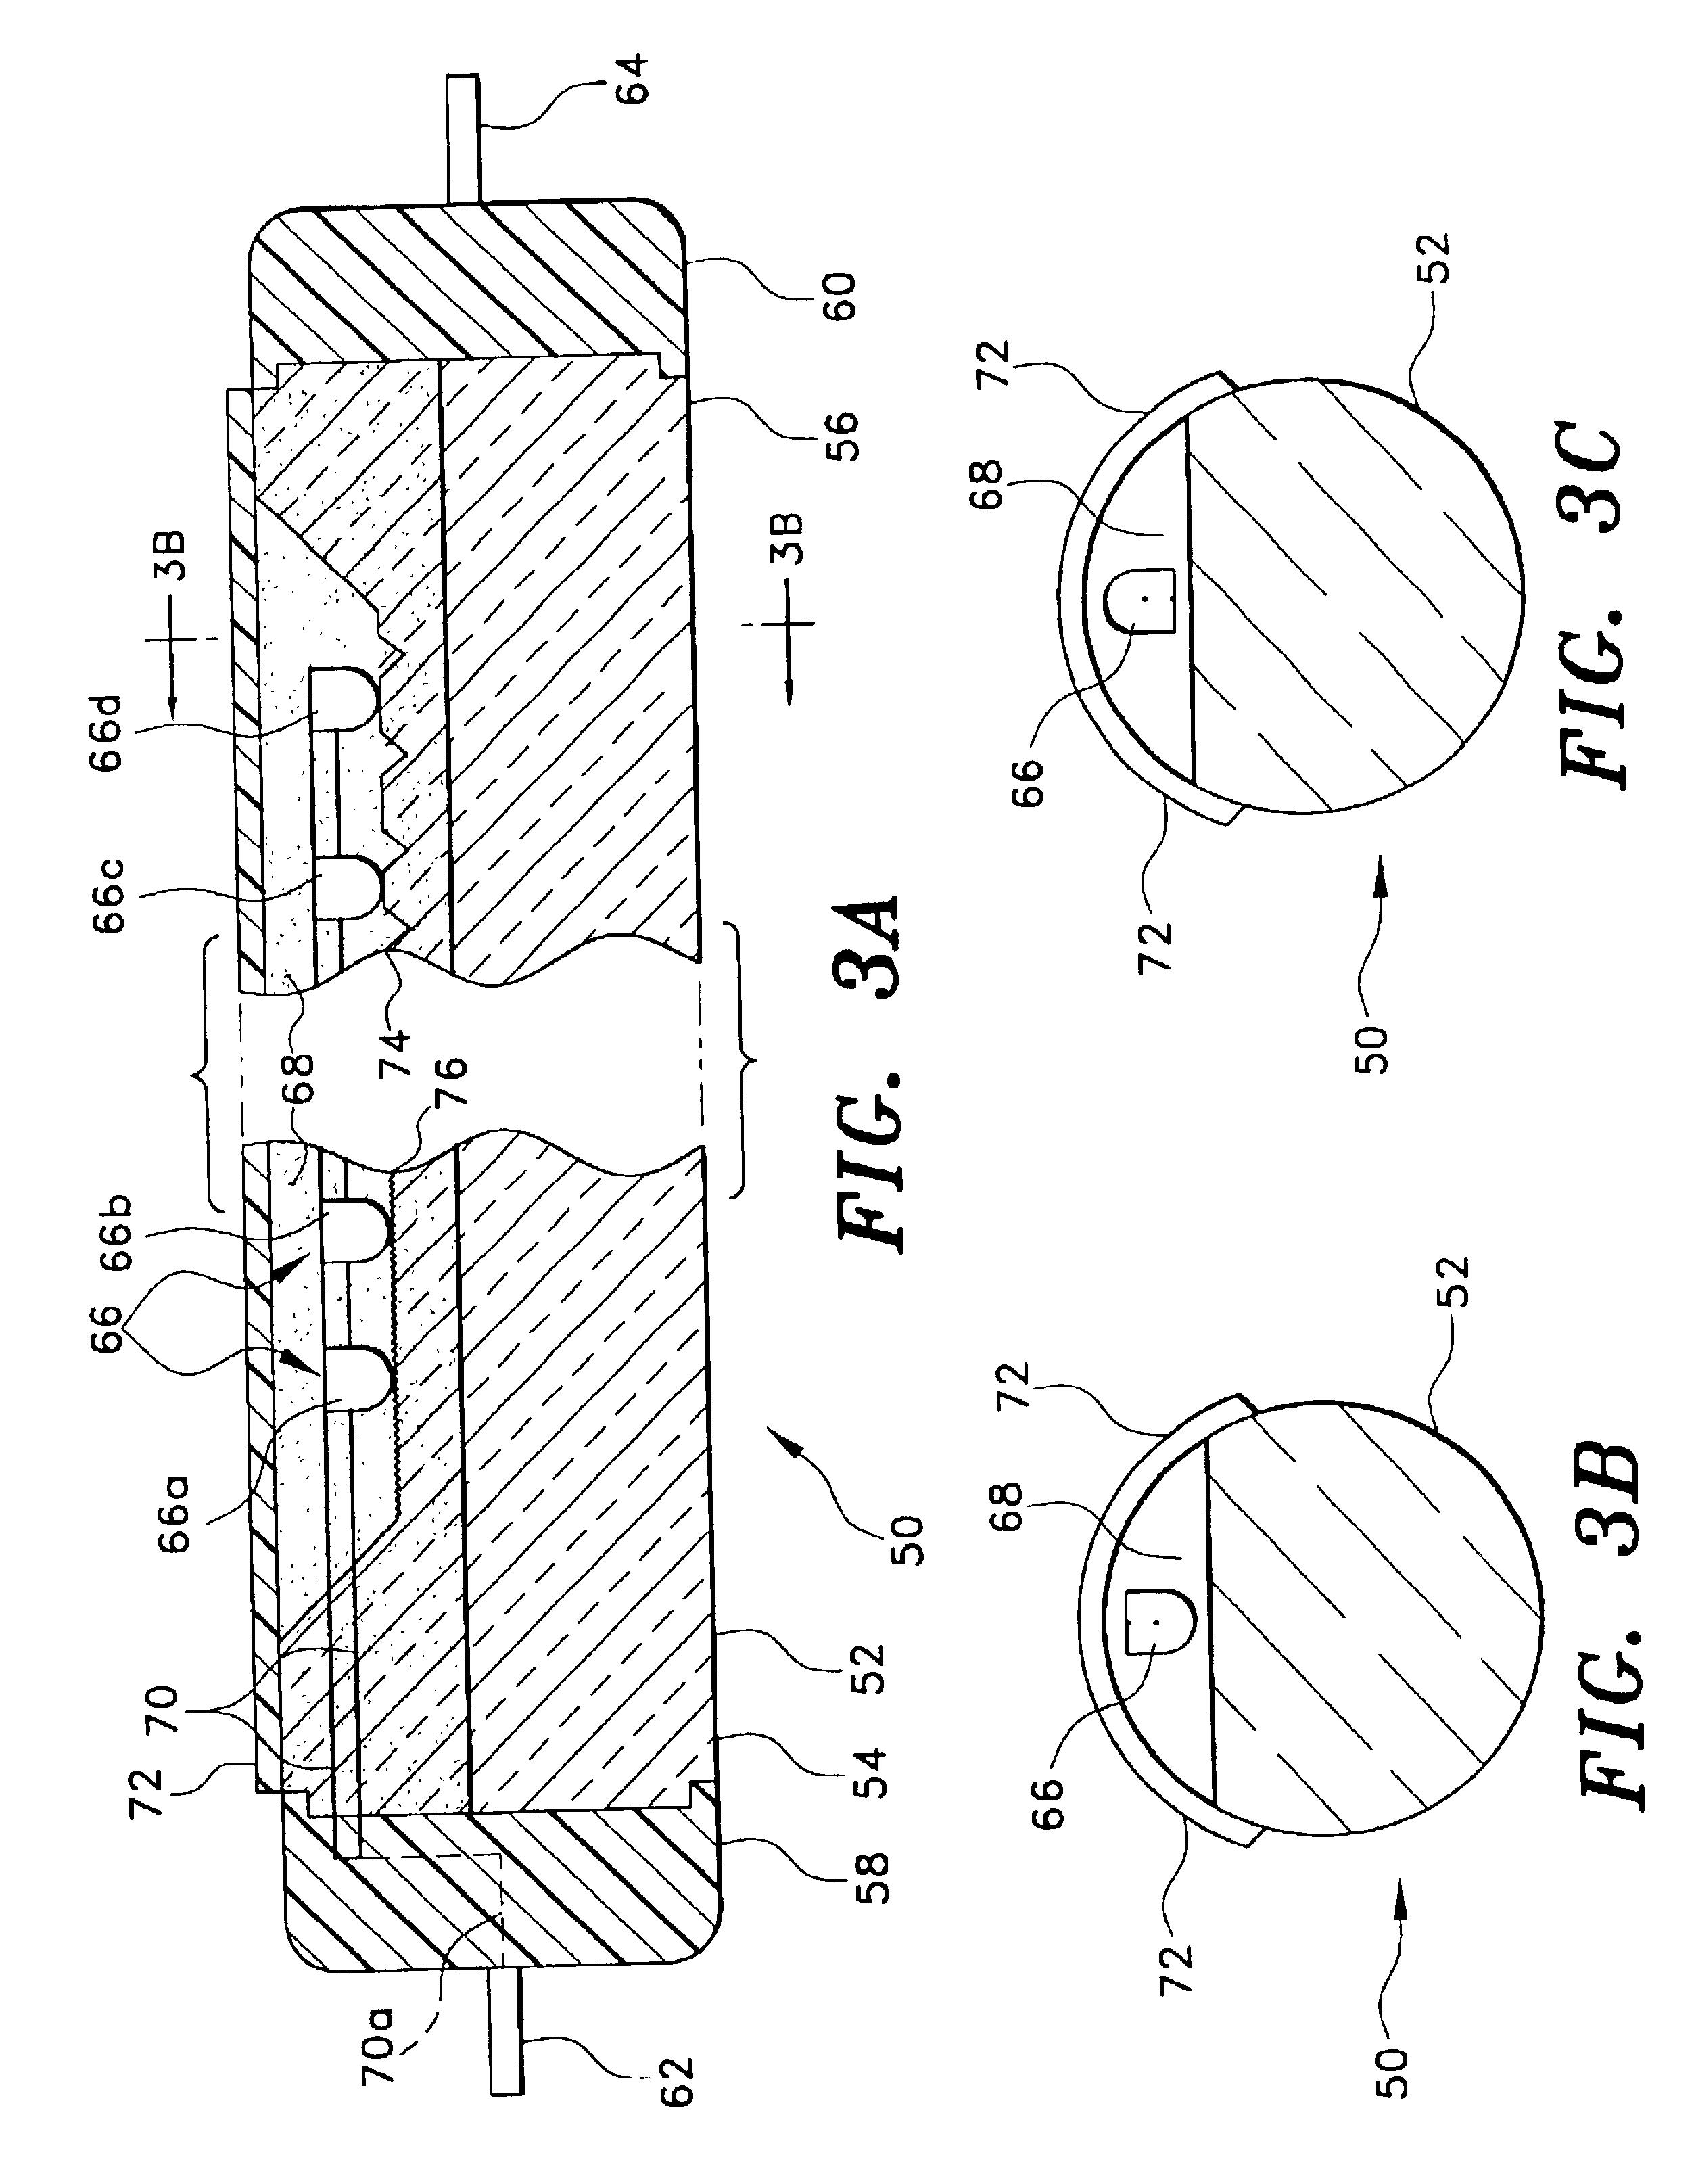 [EQHS_1162]  BZ_8281] 2007 Jeep Commander Fuse Diagram Wiring Diagram | 2007 Jeep Commander Interior Fuse Box Diagram |  | Perm Leona Mohammedshrine Librar Wiring 101